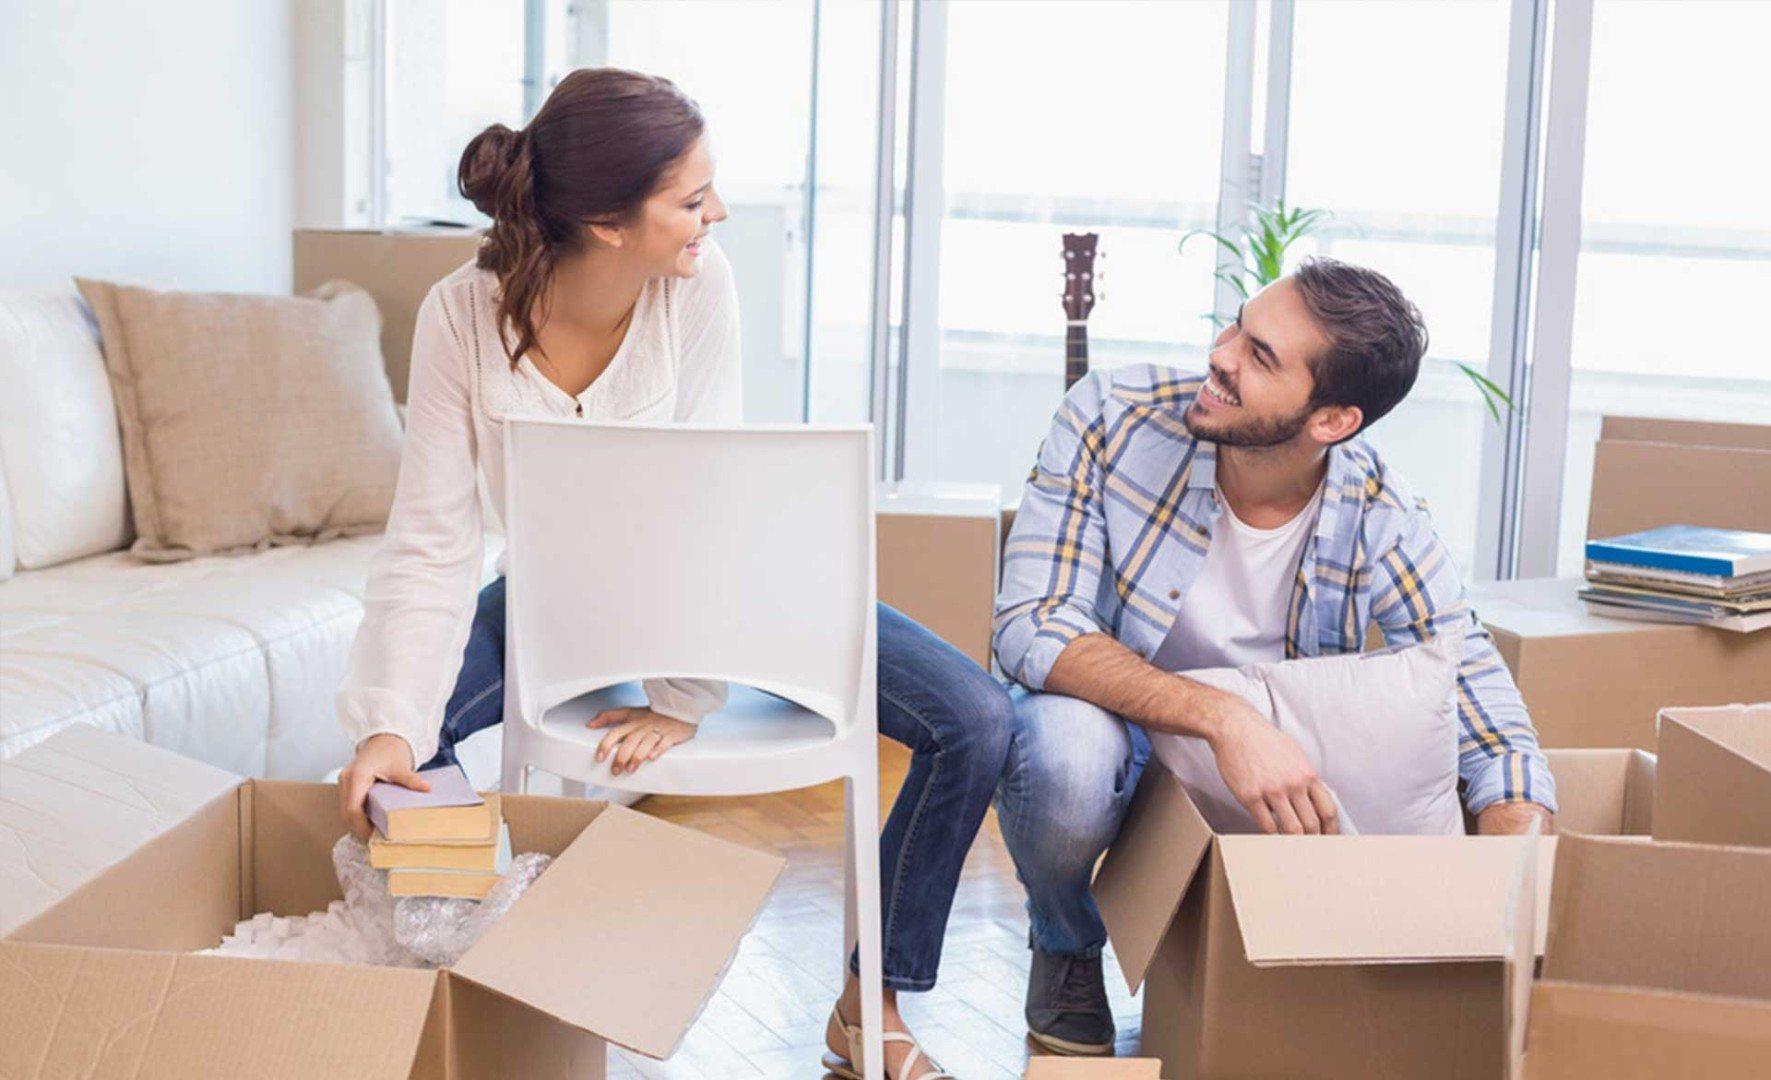 boston-housing-relocation-services